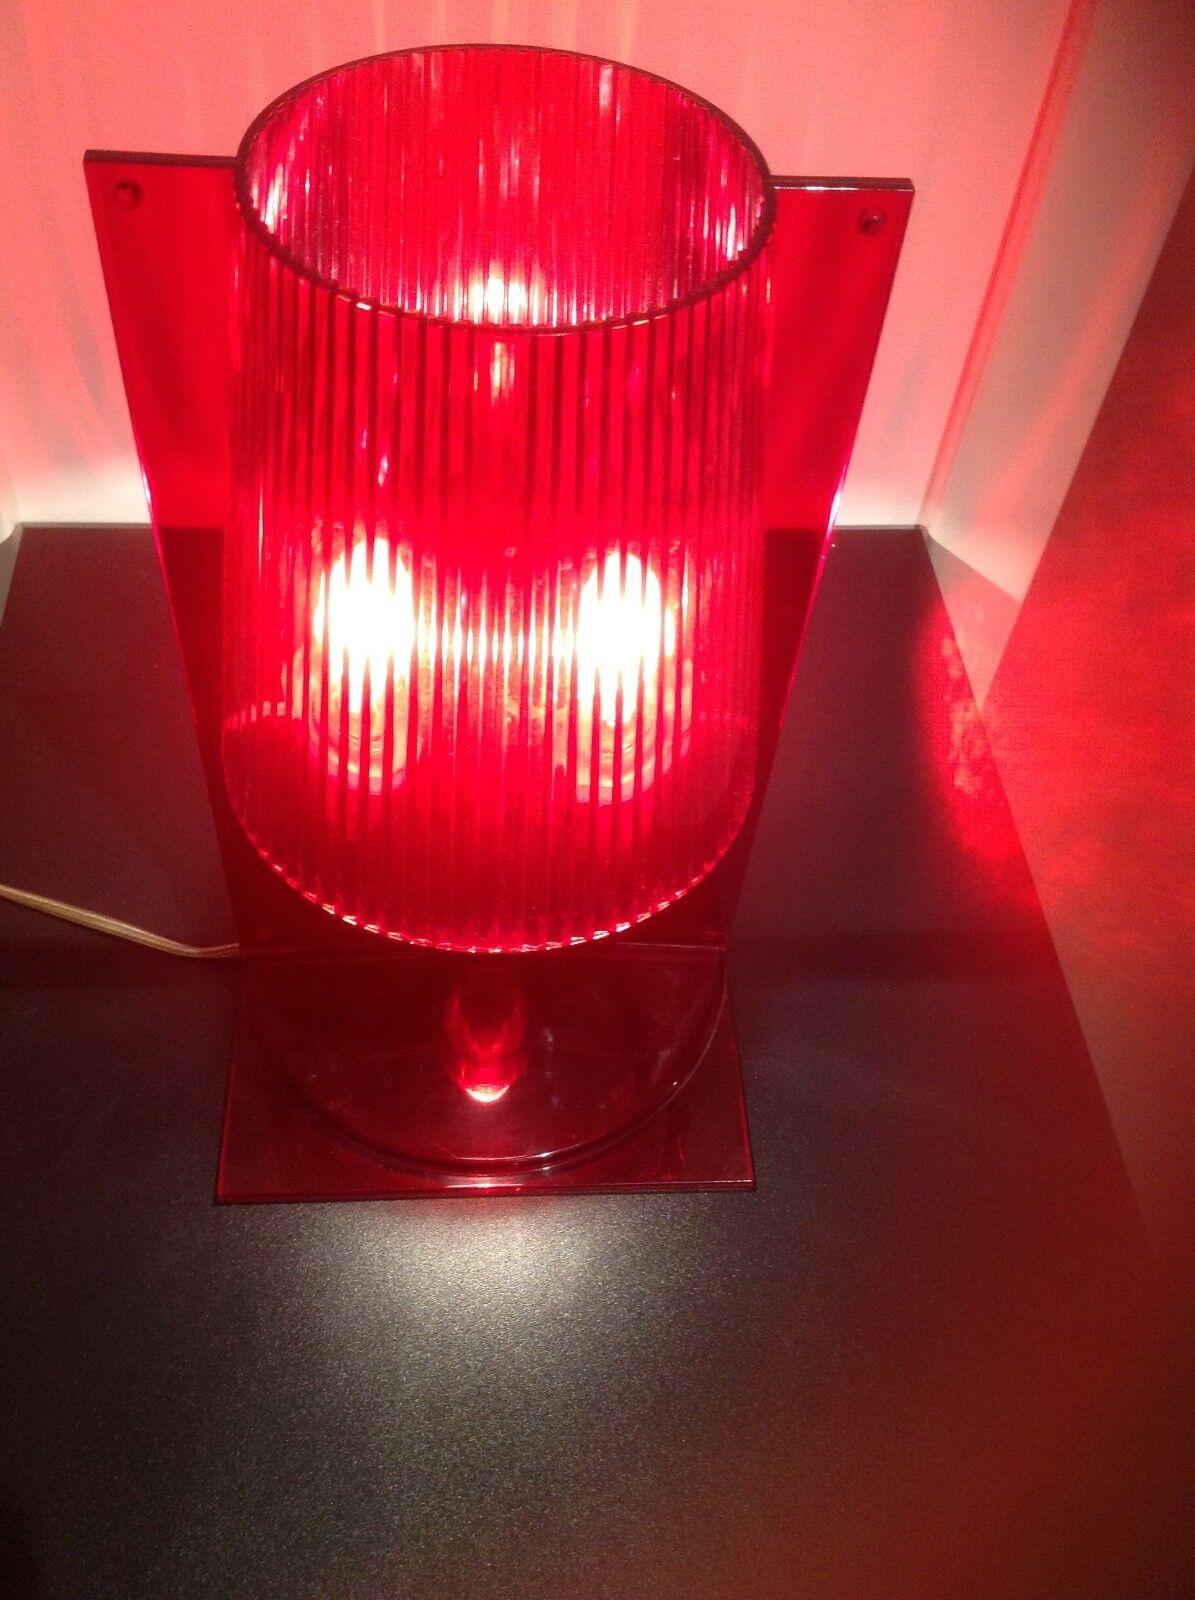 KARTELL Take Tischlampe, Farbe  rot, einwandfrei